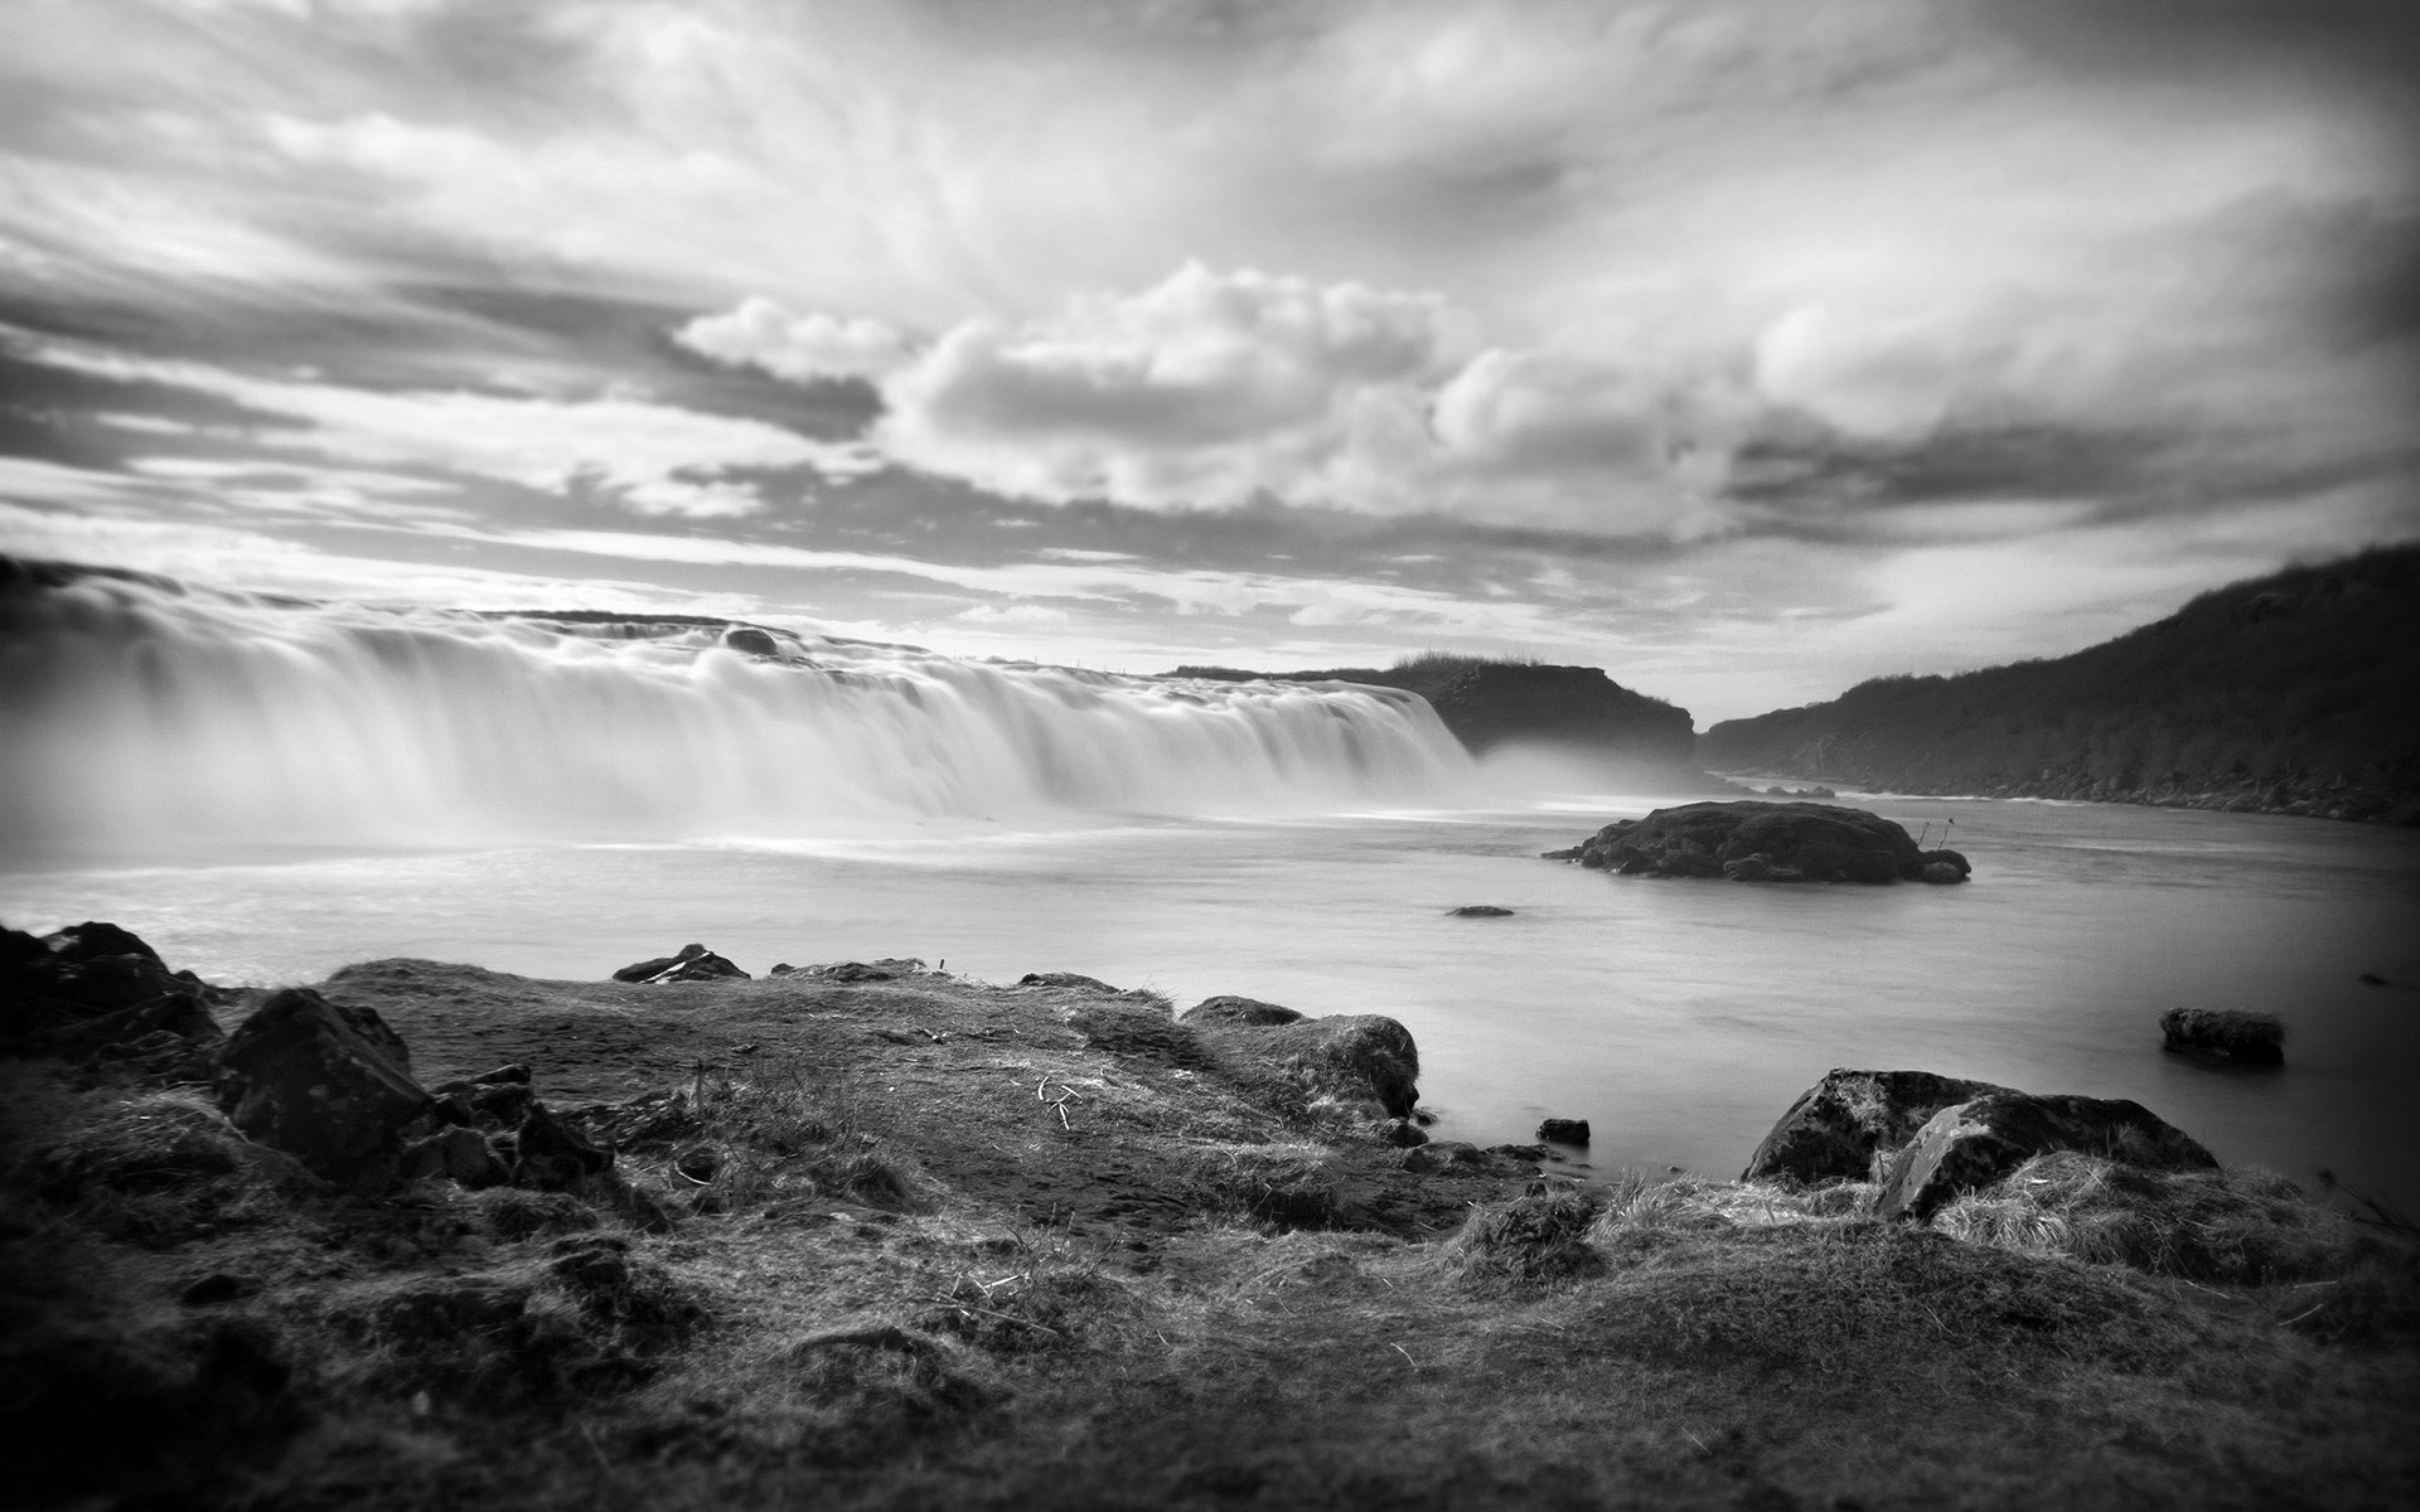 waterfall rocks flowing black and white Ultra HD 4K HD Background 3840x2400